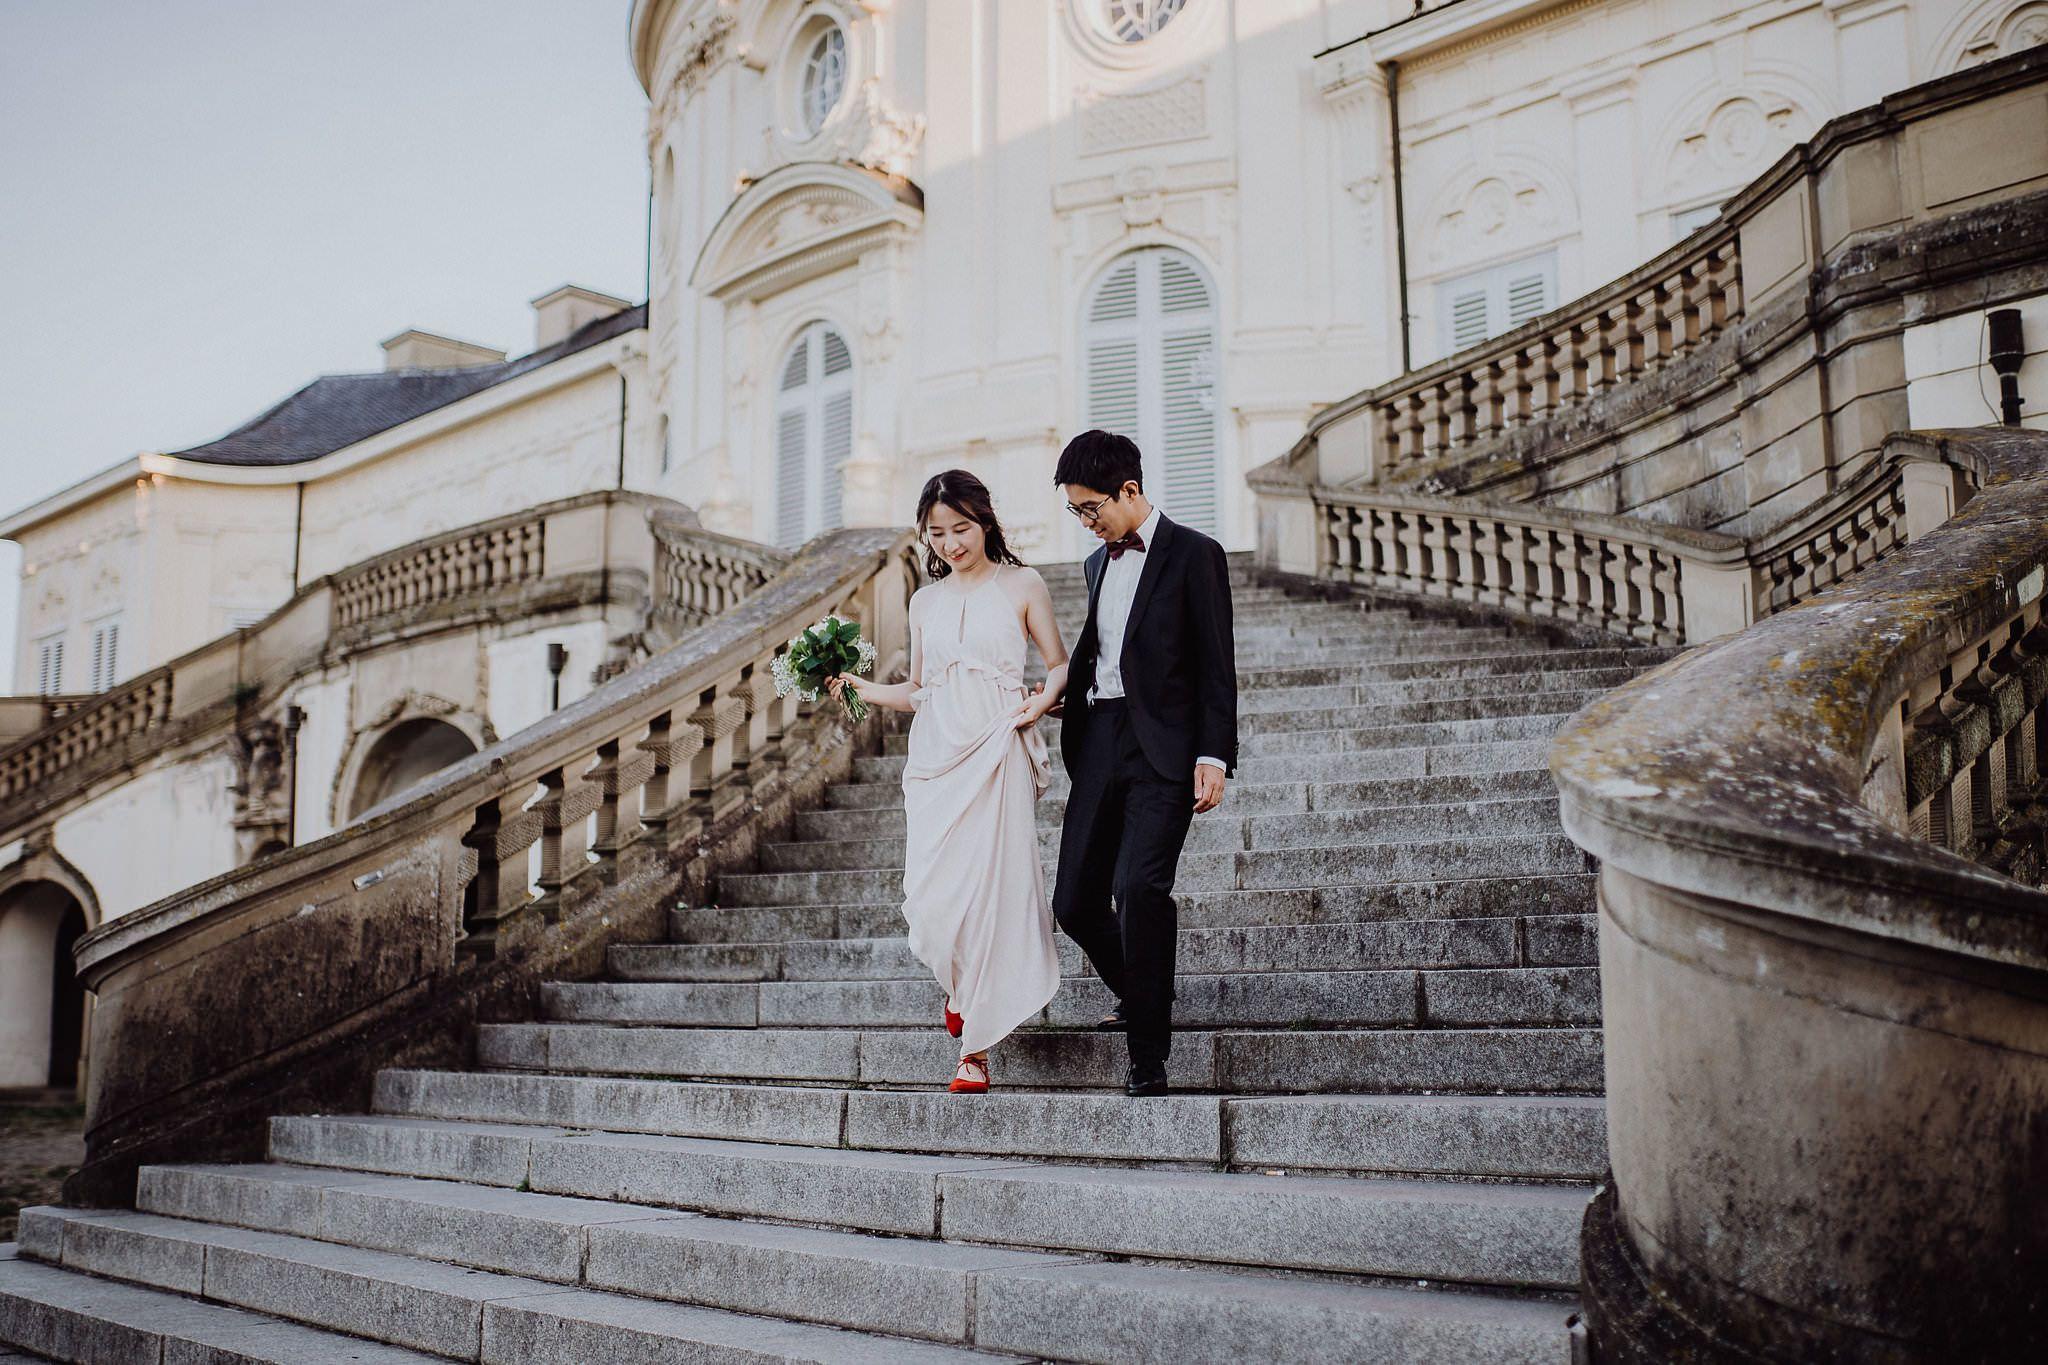 wedding photographer hamilton new zealand 1020 5